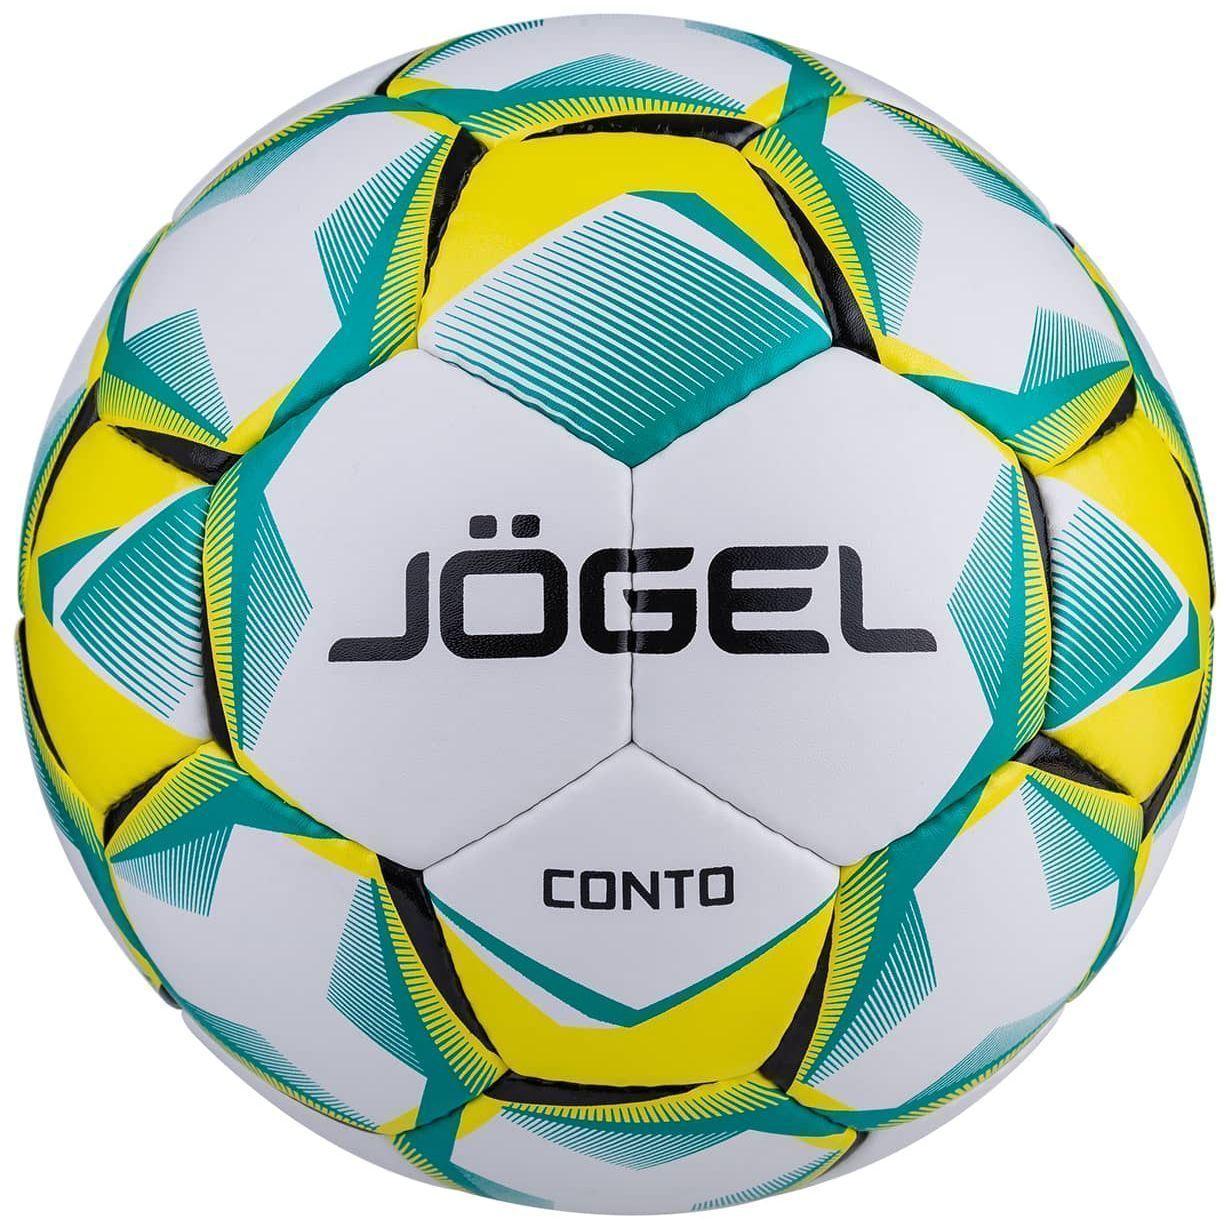 JOGEL CONTO 17593